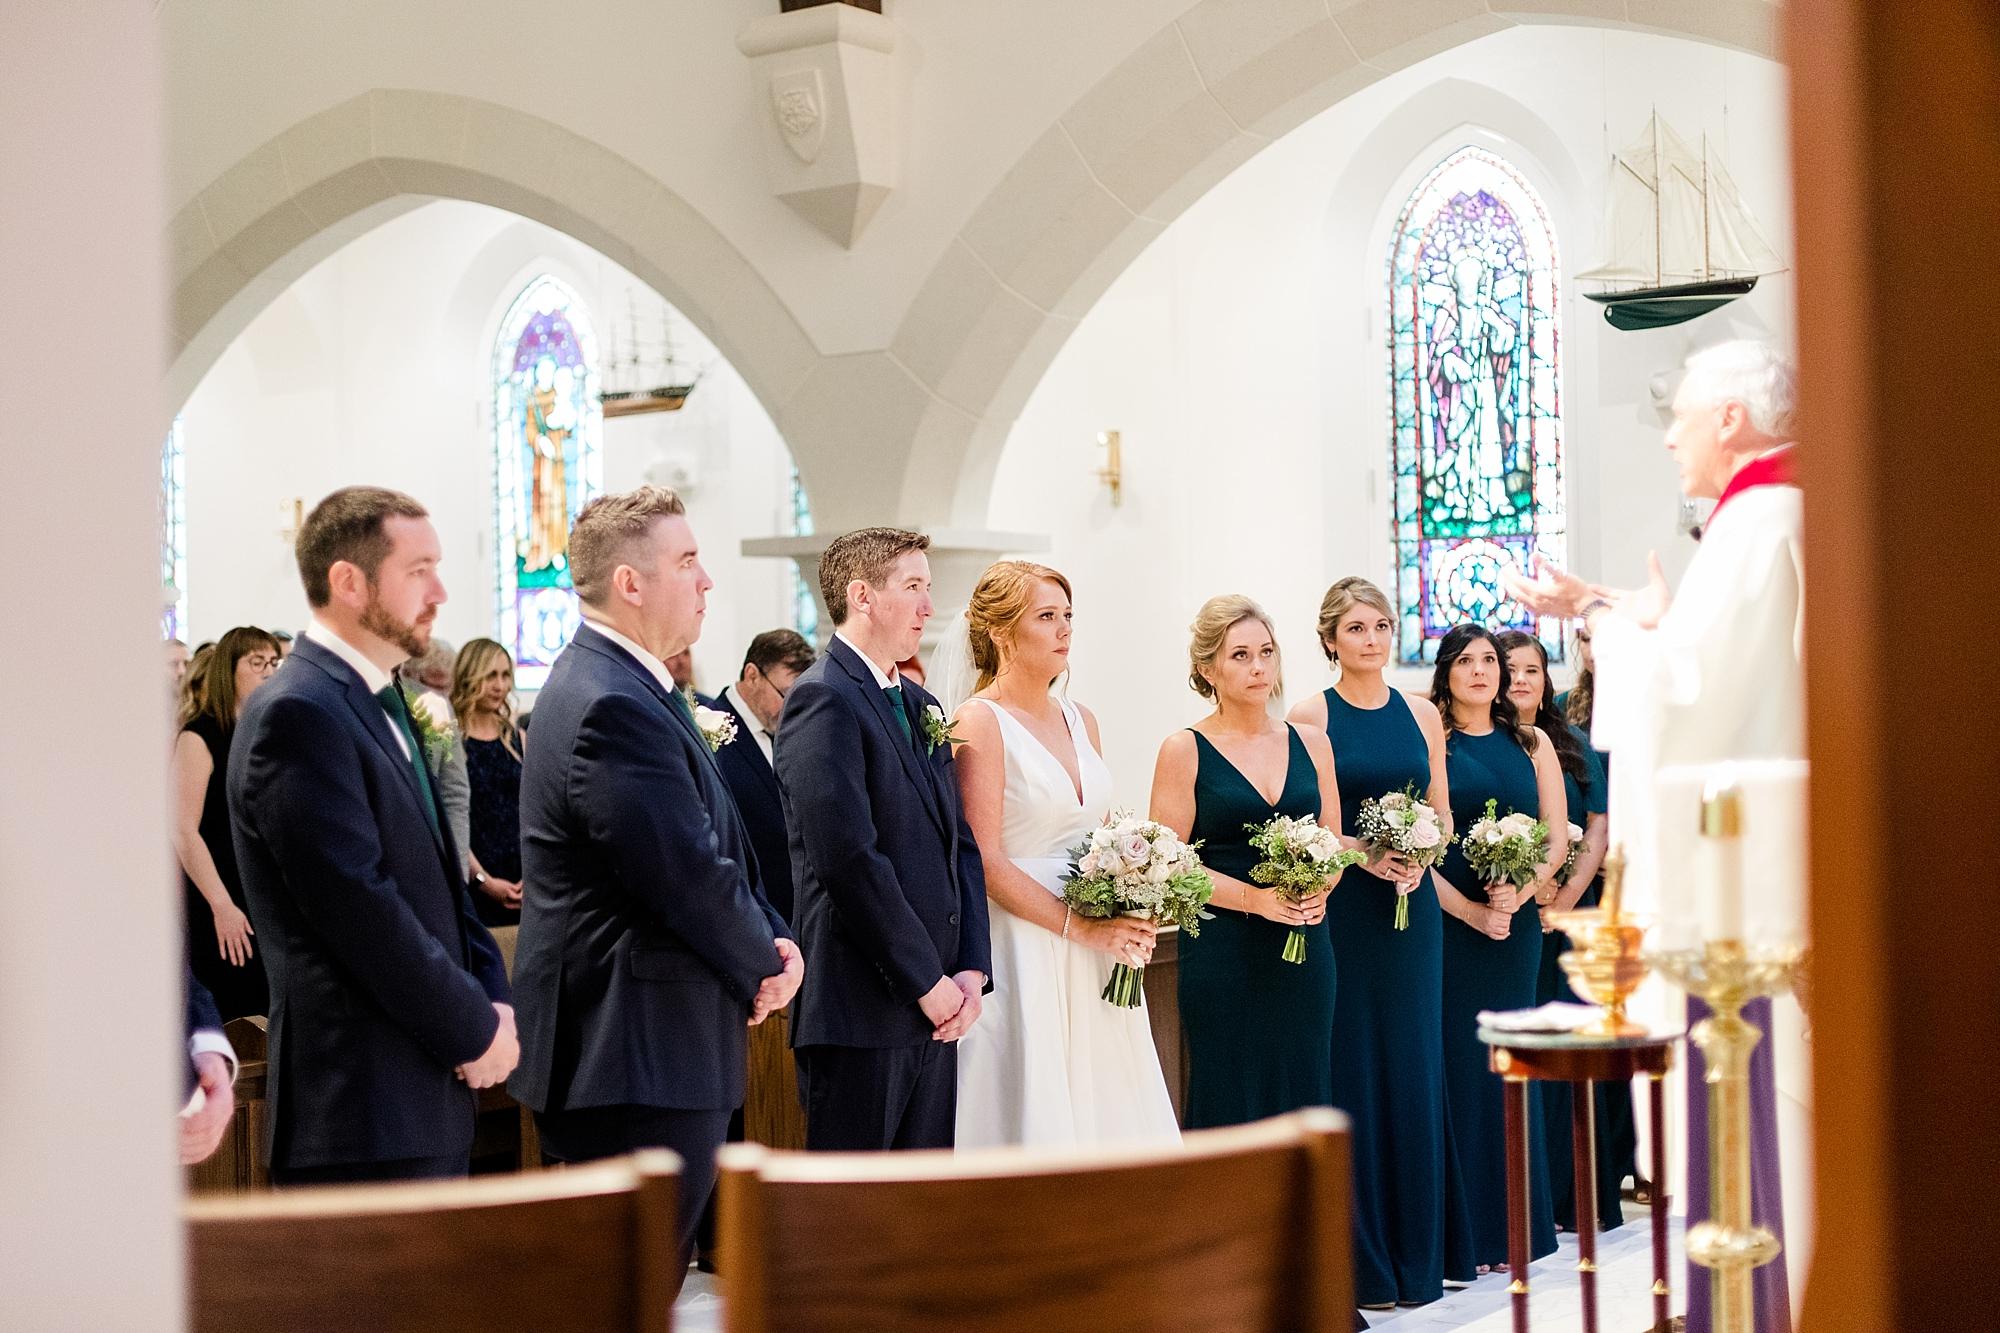 eisleyimages-irish-wedding-boston-seaport_0068.jpg